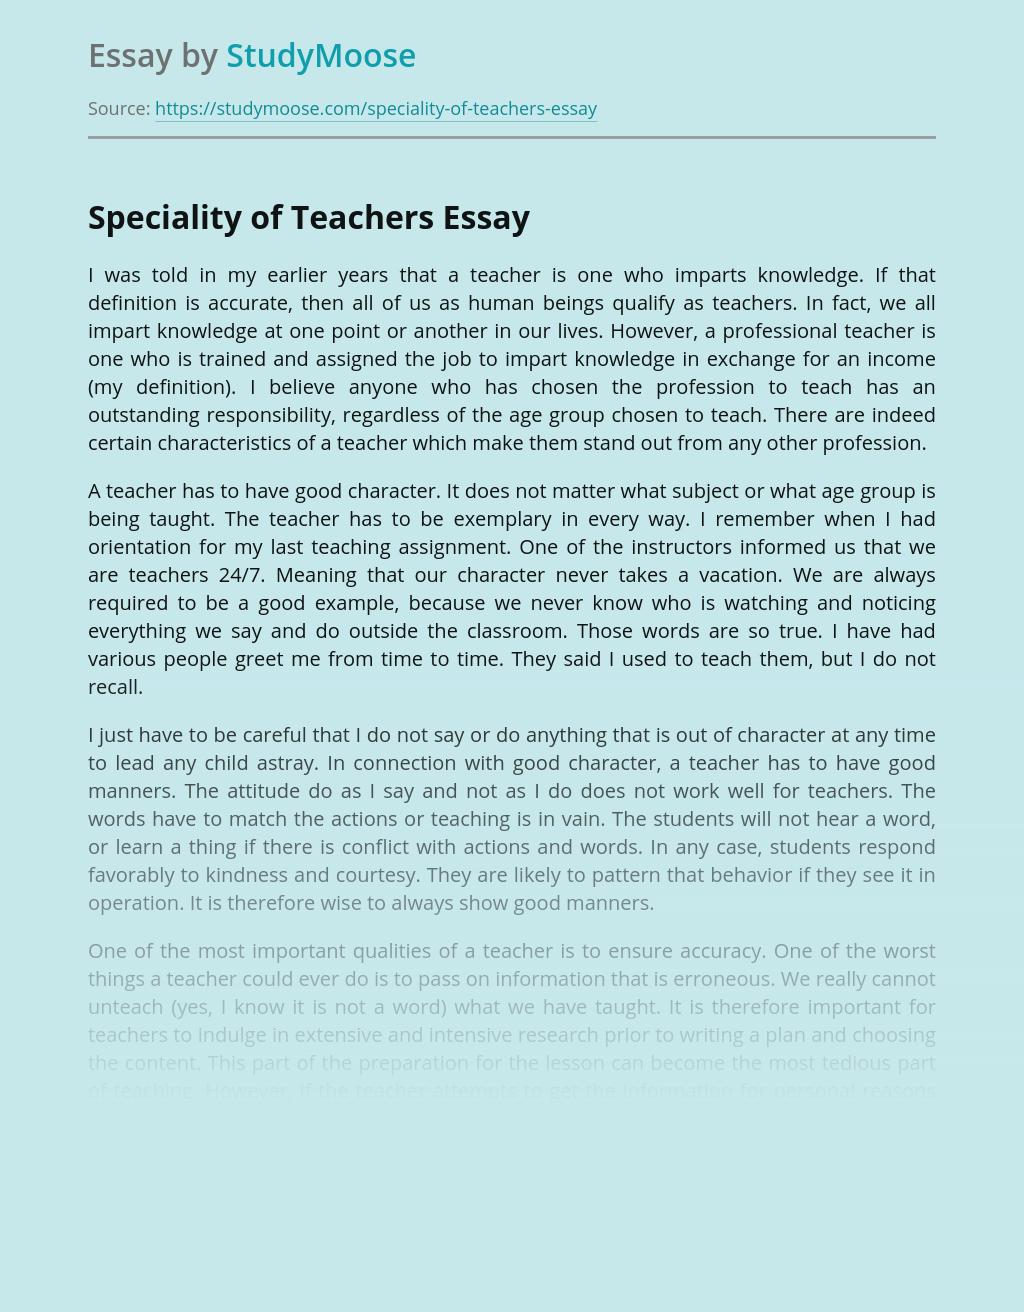 Speciality of Teachers